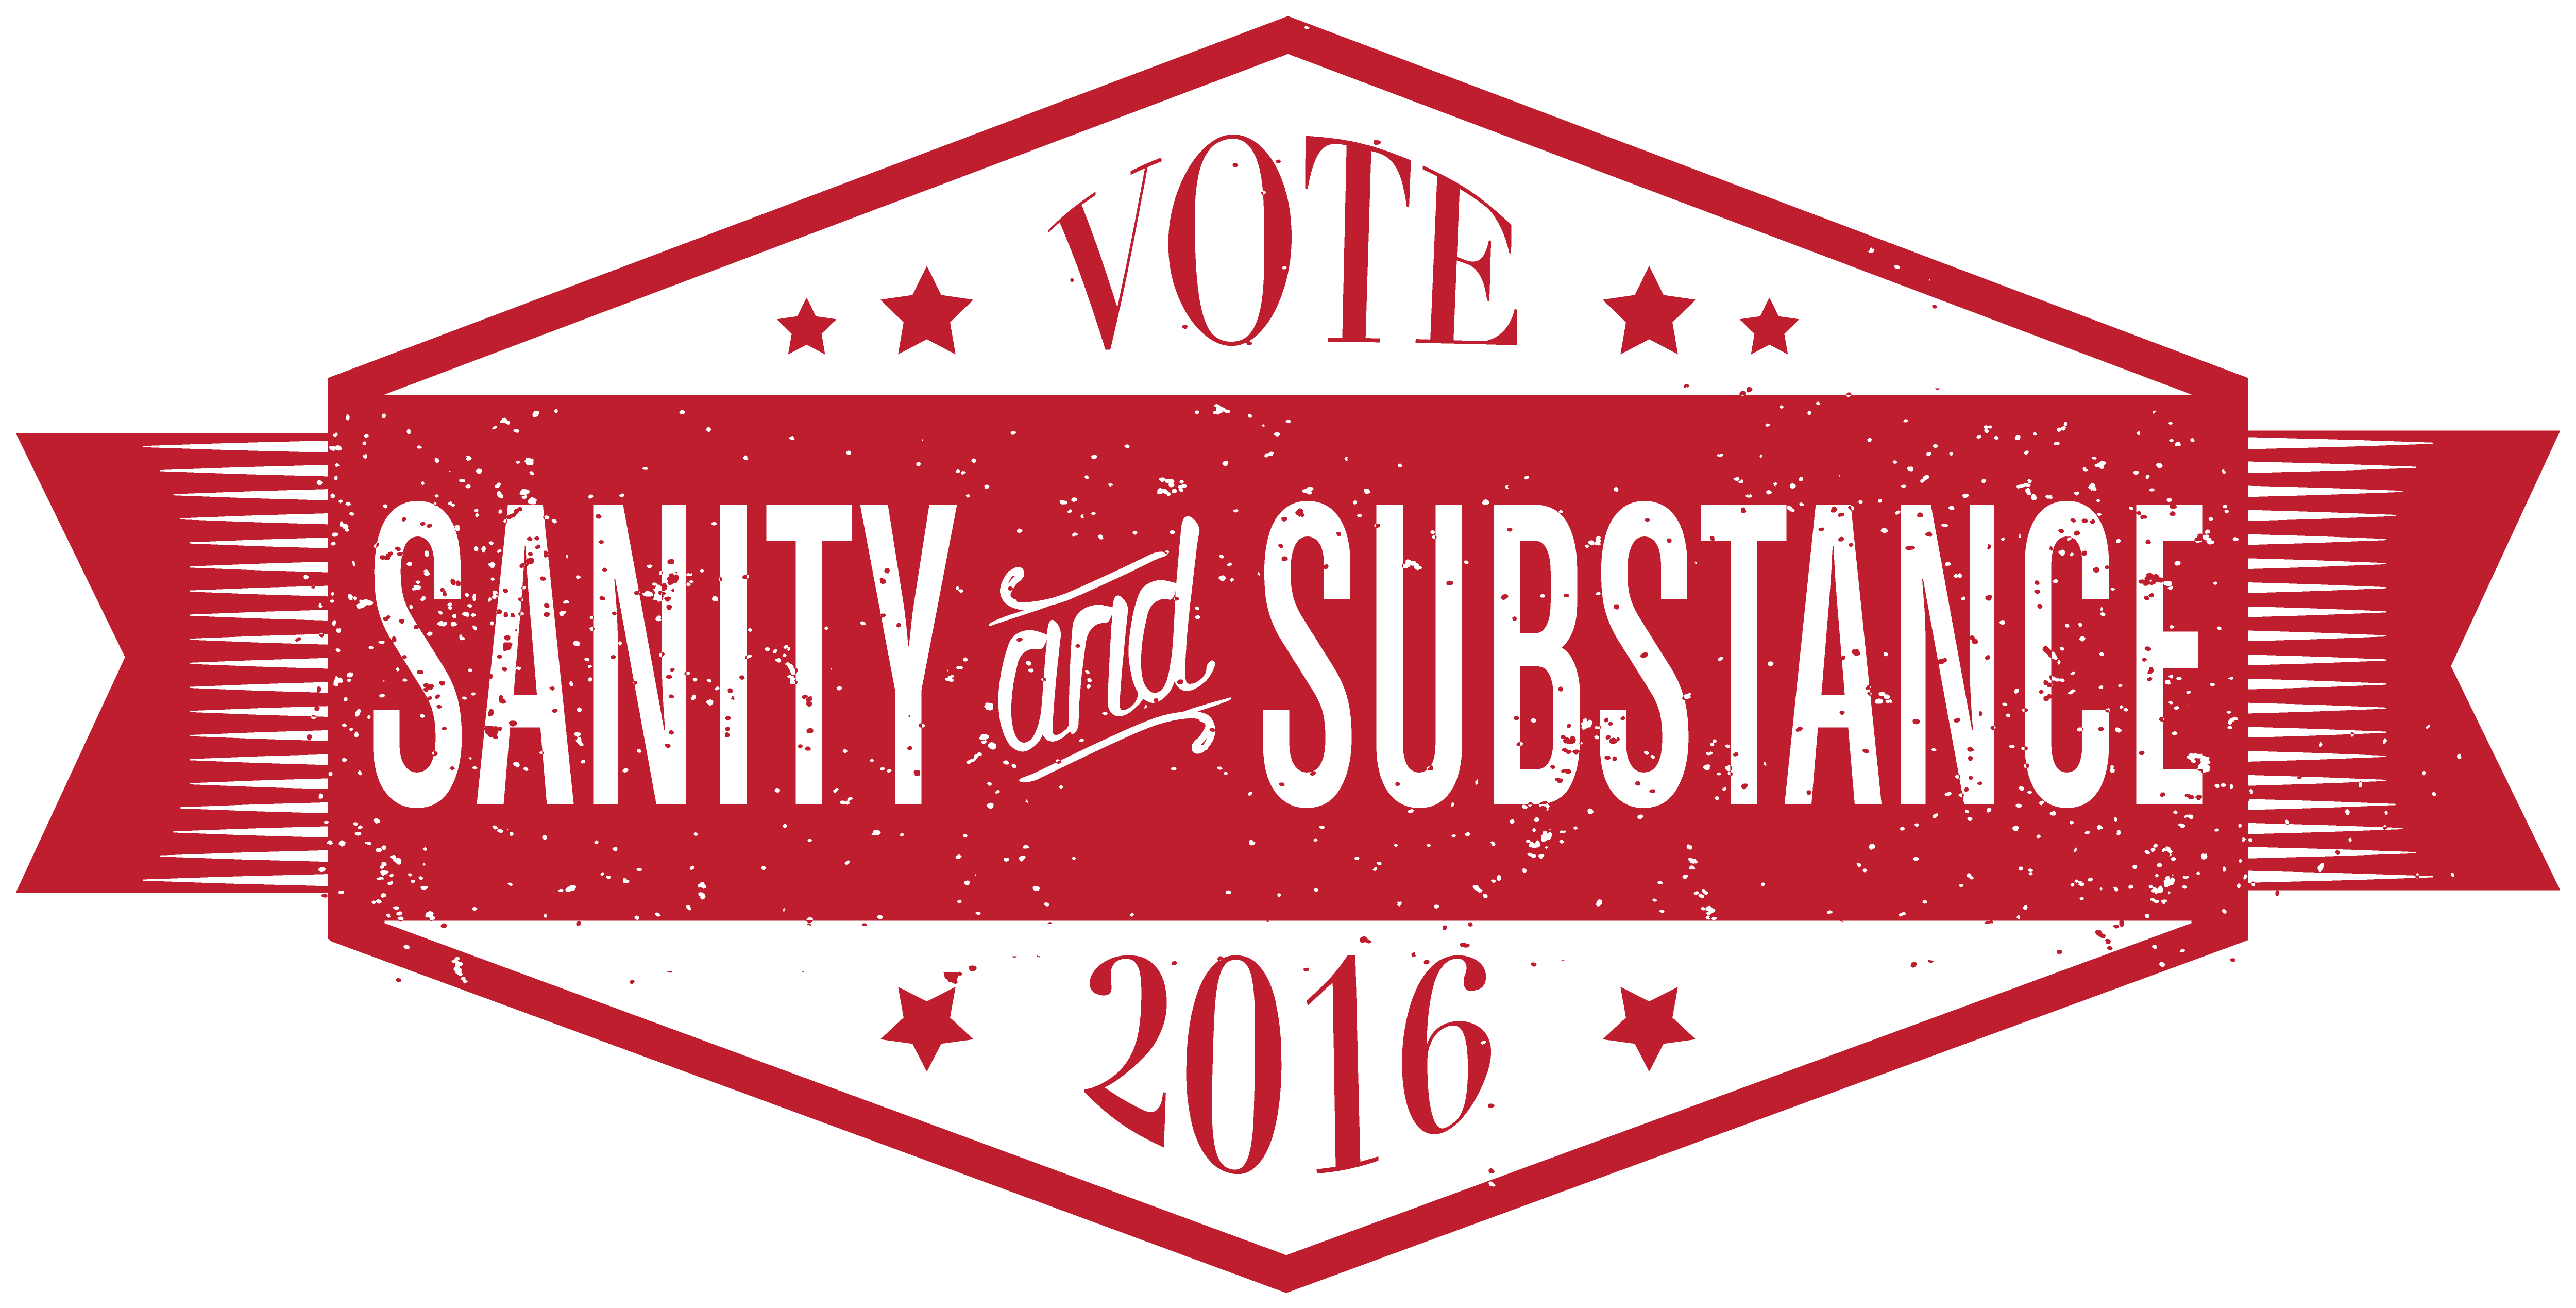 Sanity & Substance 2016 second logo